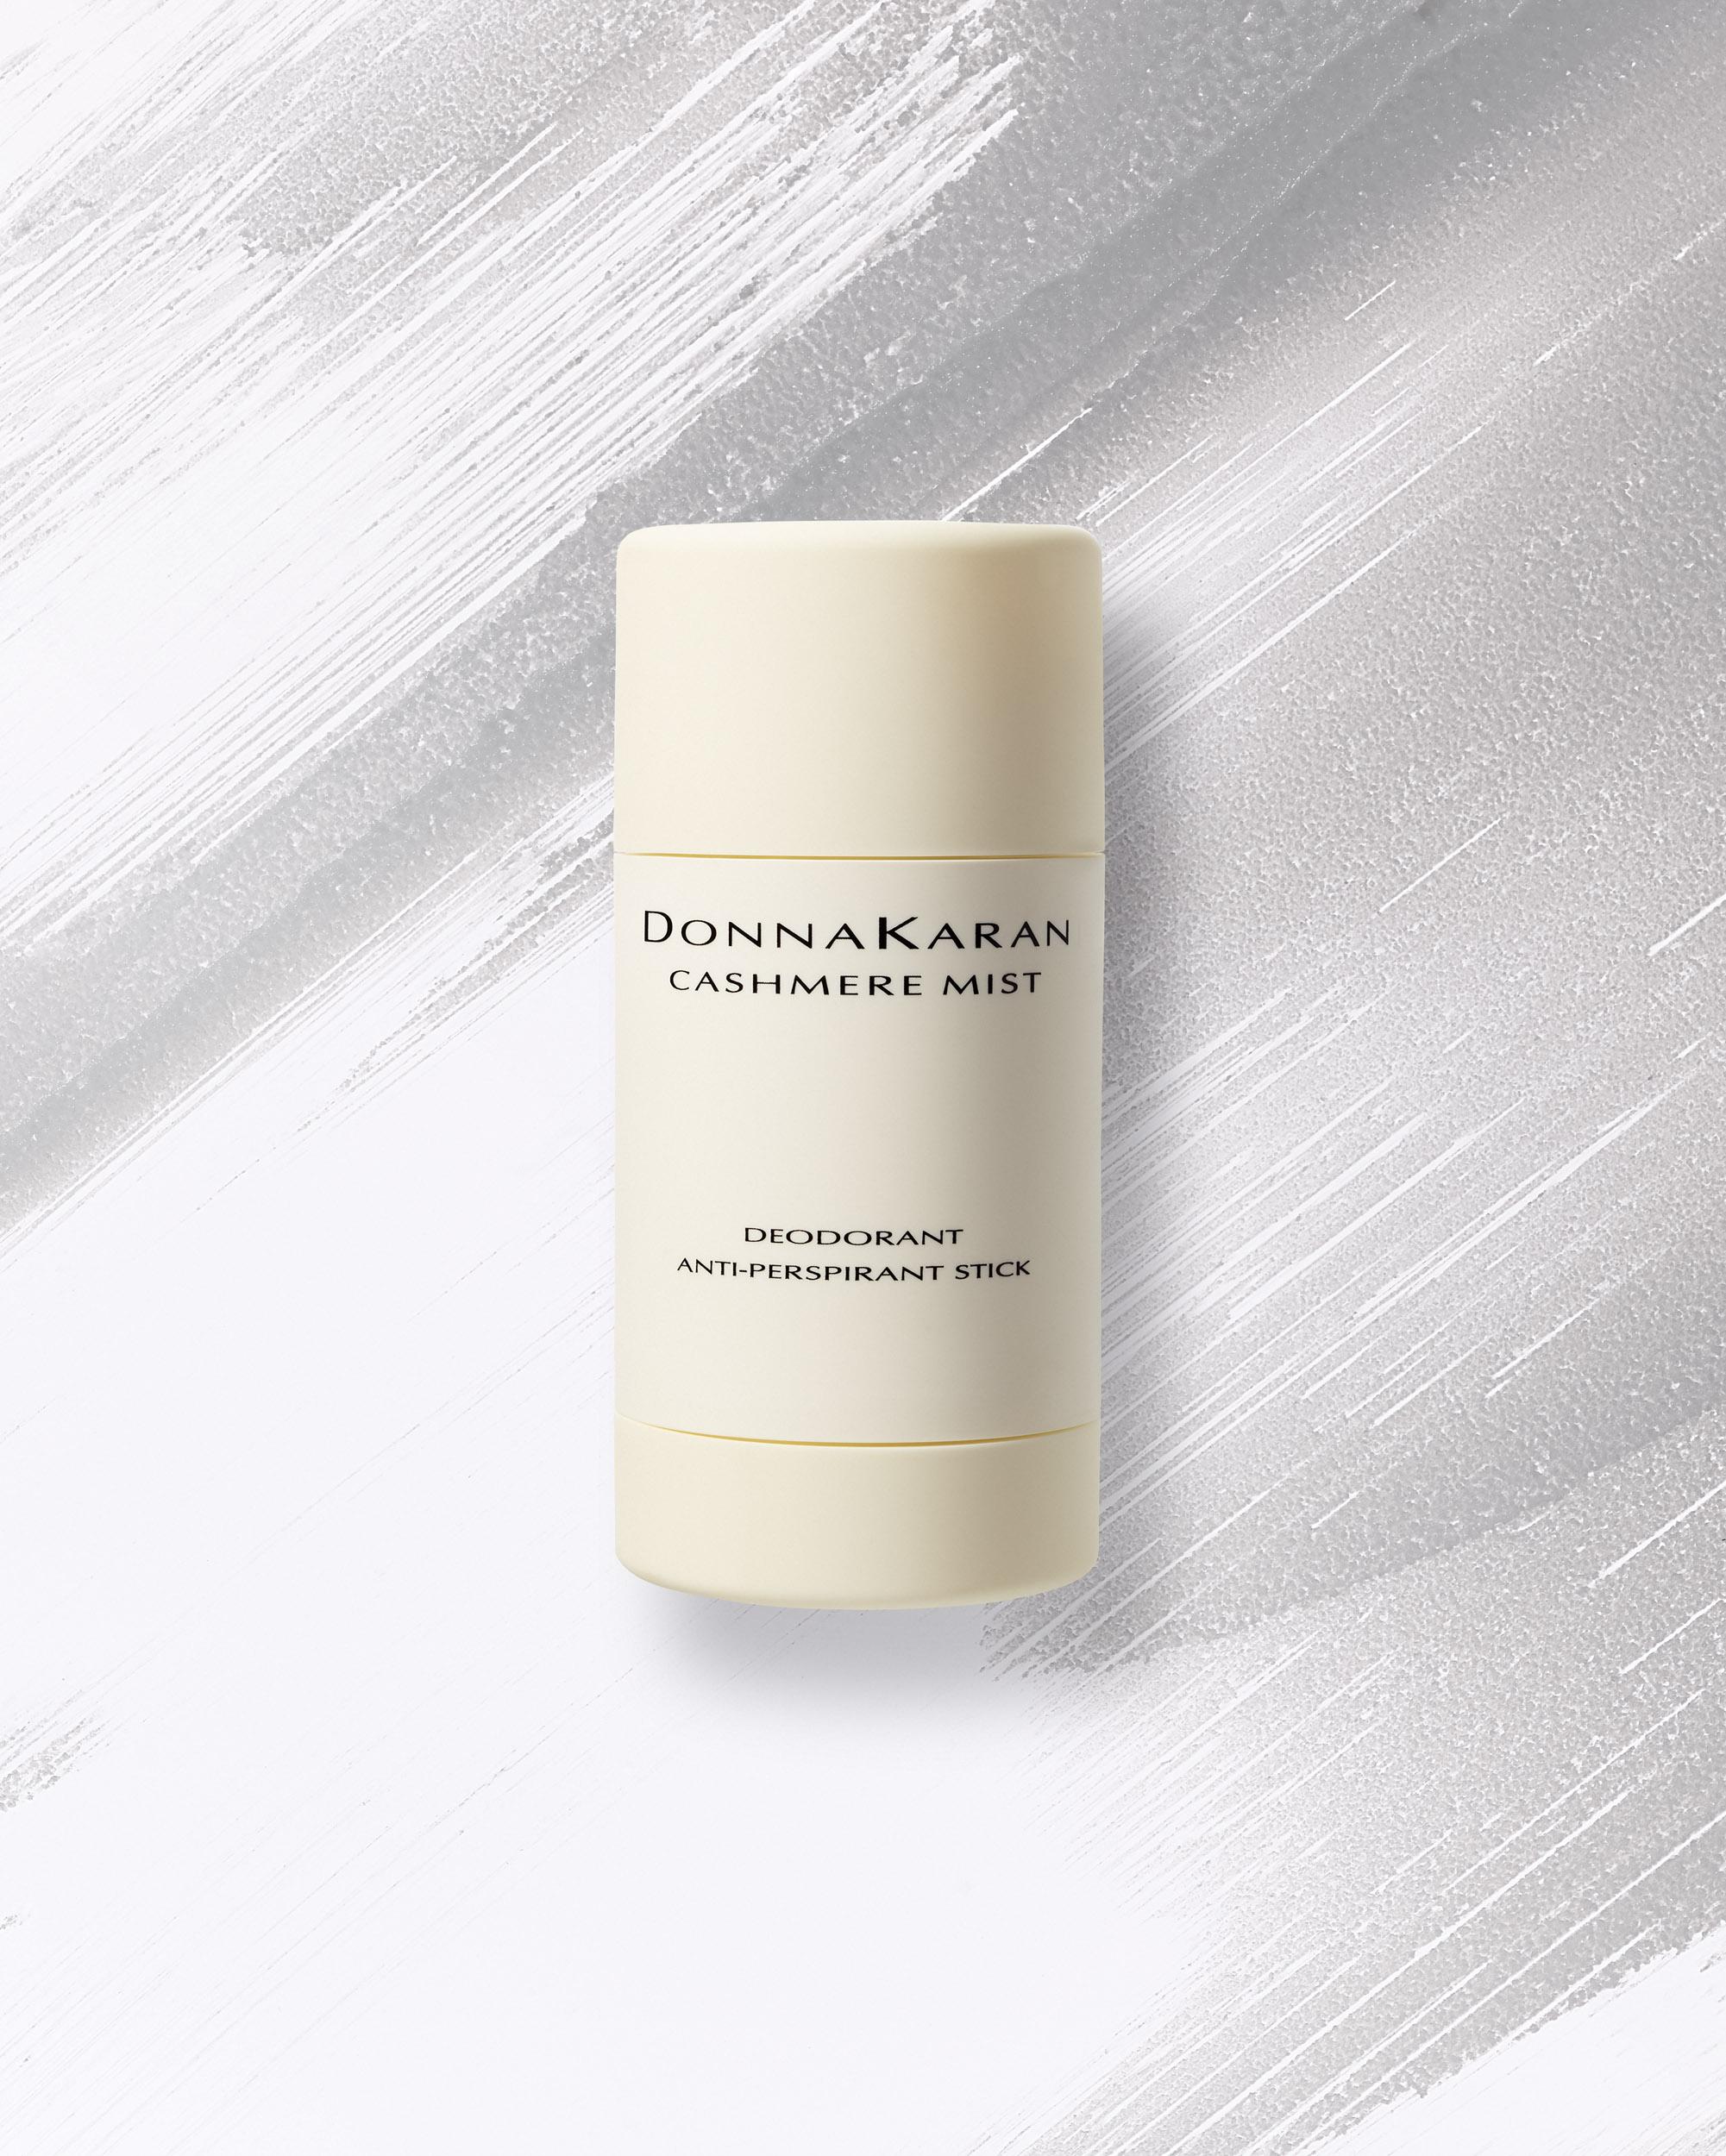 3087_17_MC_DKNY_+++D1_Texture_Deodorant_13974_R1_1.jpg